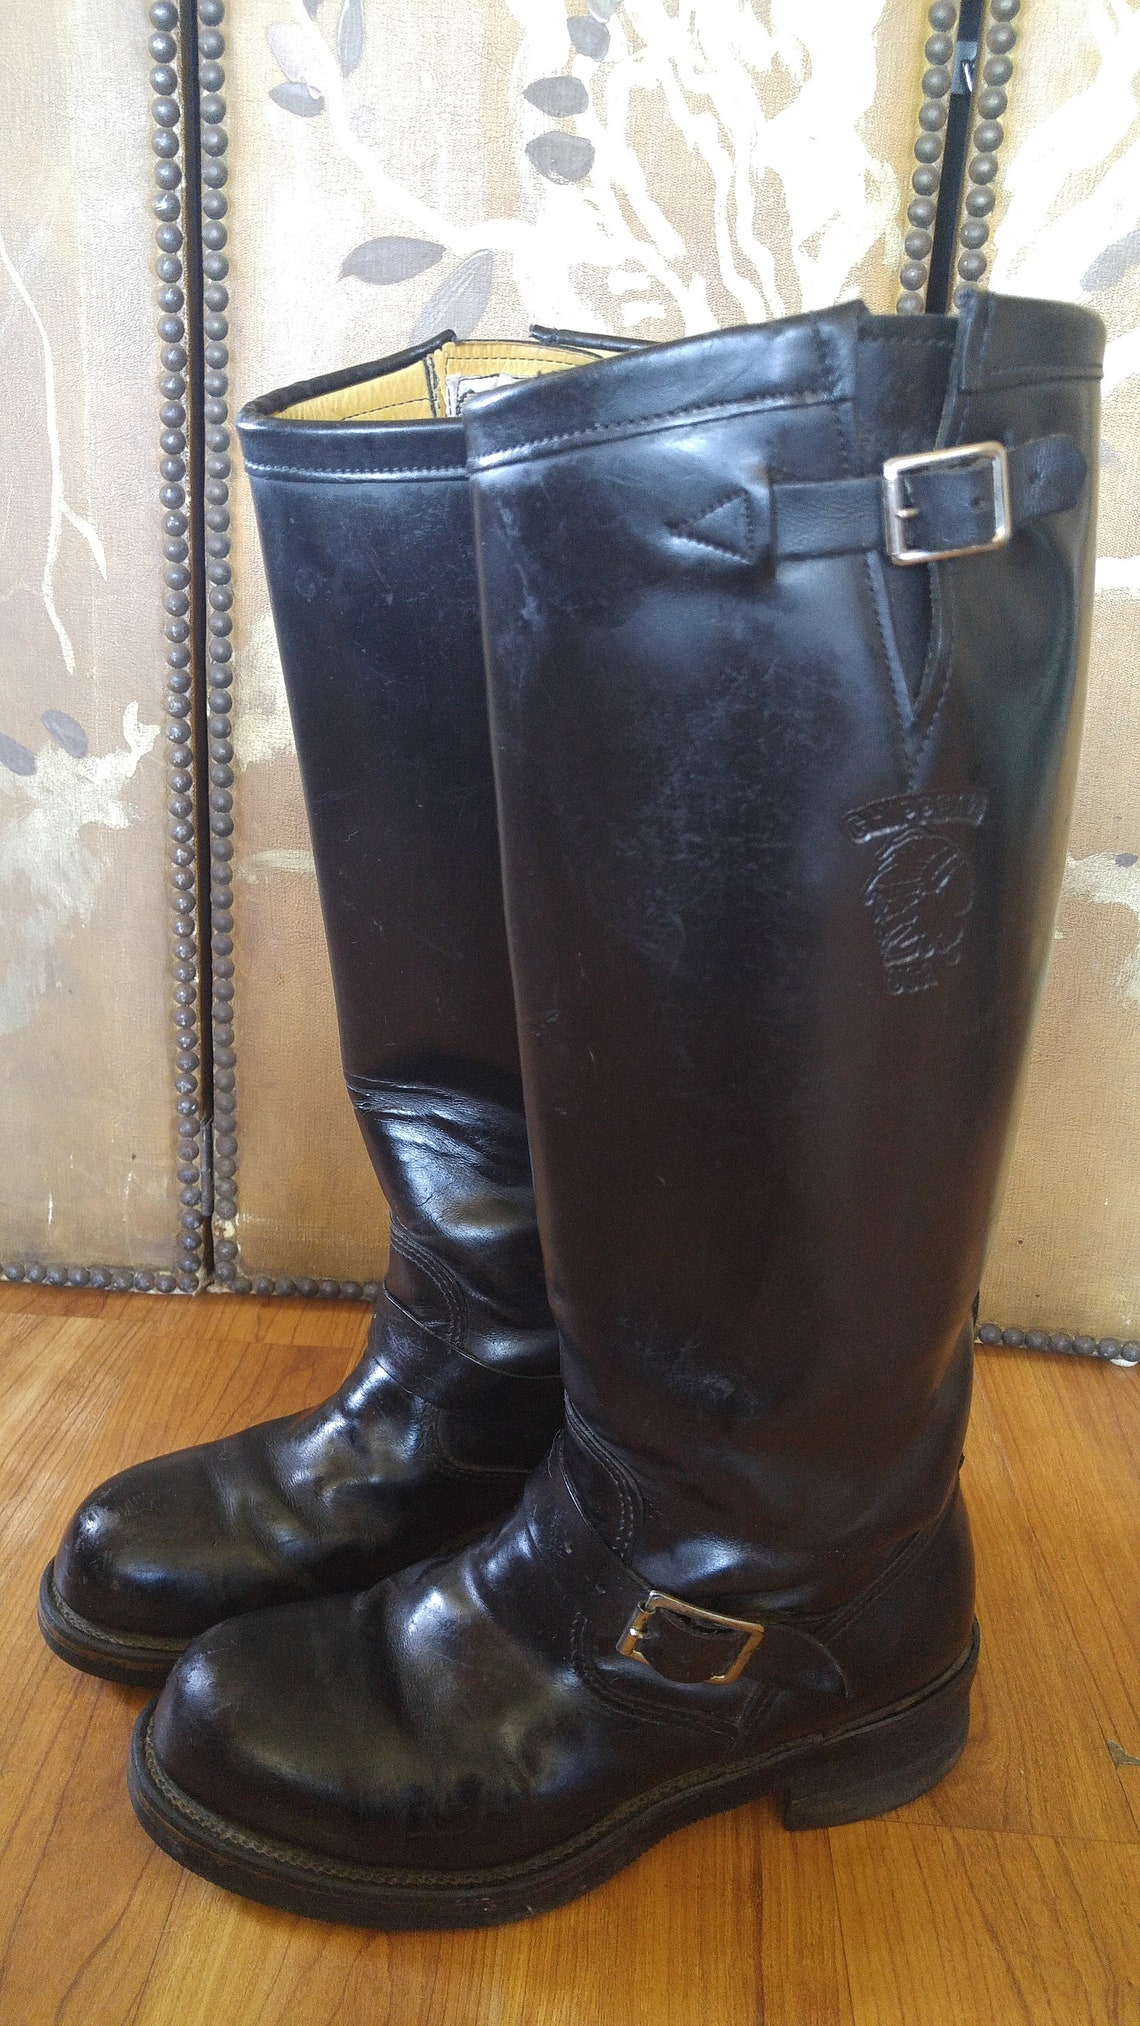 SALE! 80's Black leather Chippewa Men's knee length biker / motorcycle / linesman/ trucker boots